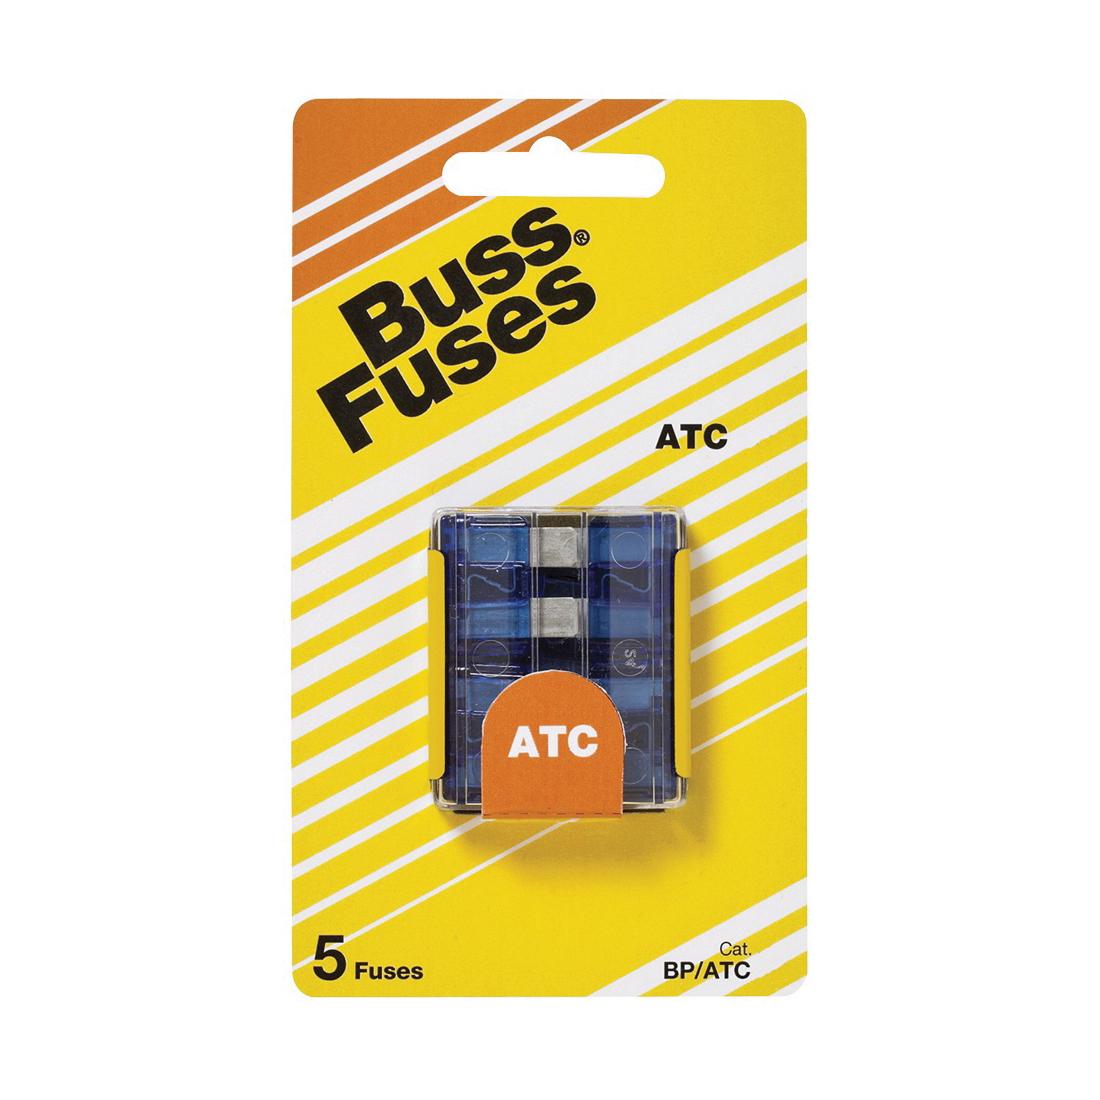 Picture of Bussmann BP/ATC-40-RP Blade Fuse, 32 VDC, 40 A, 1 kA Interrupt